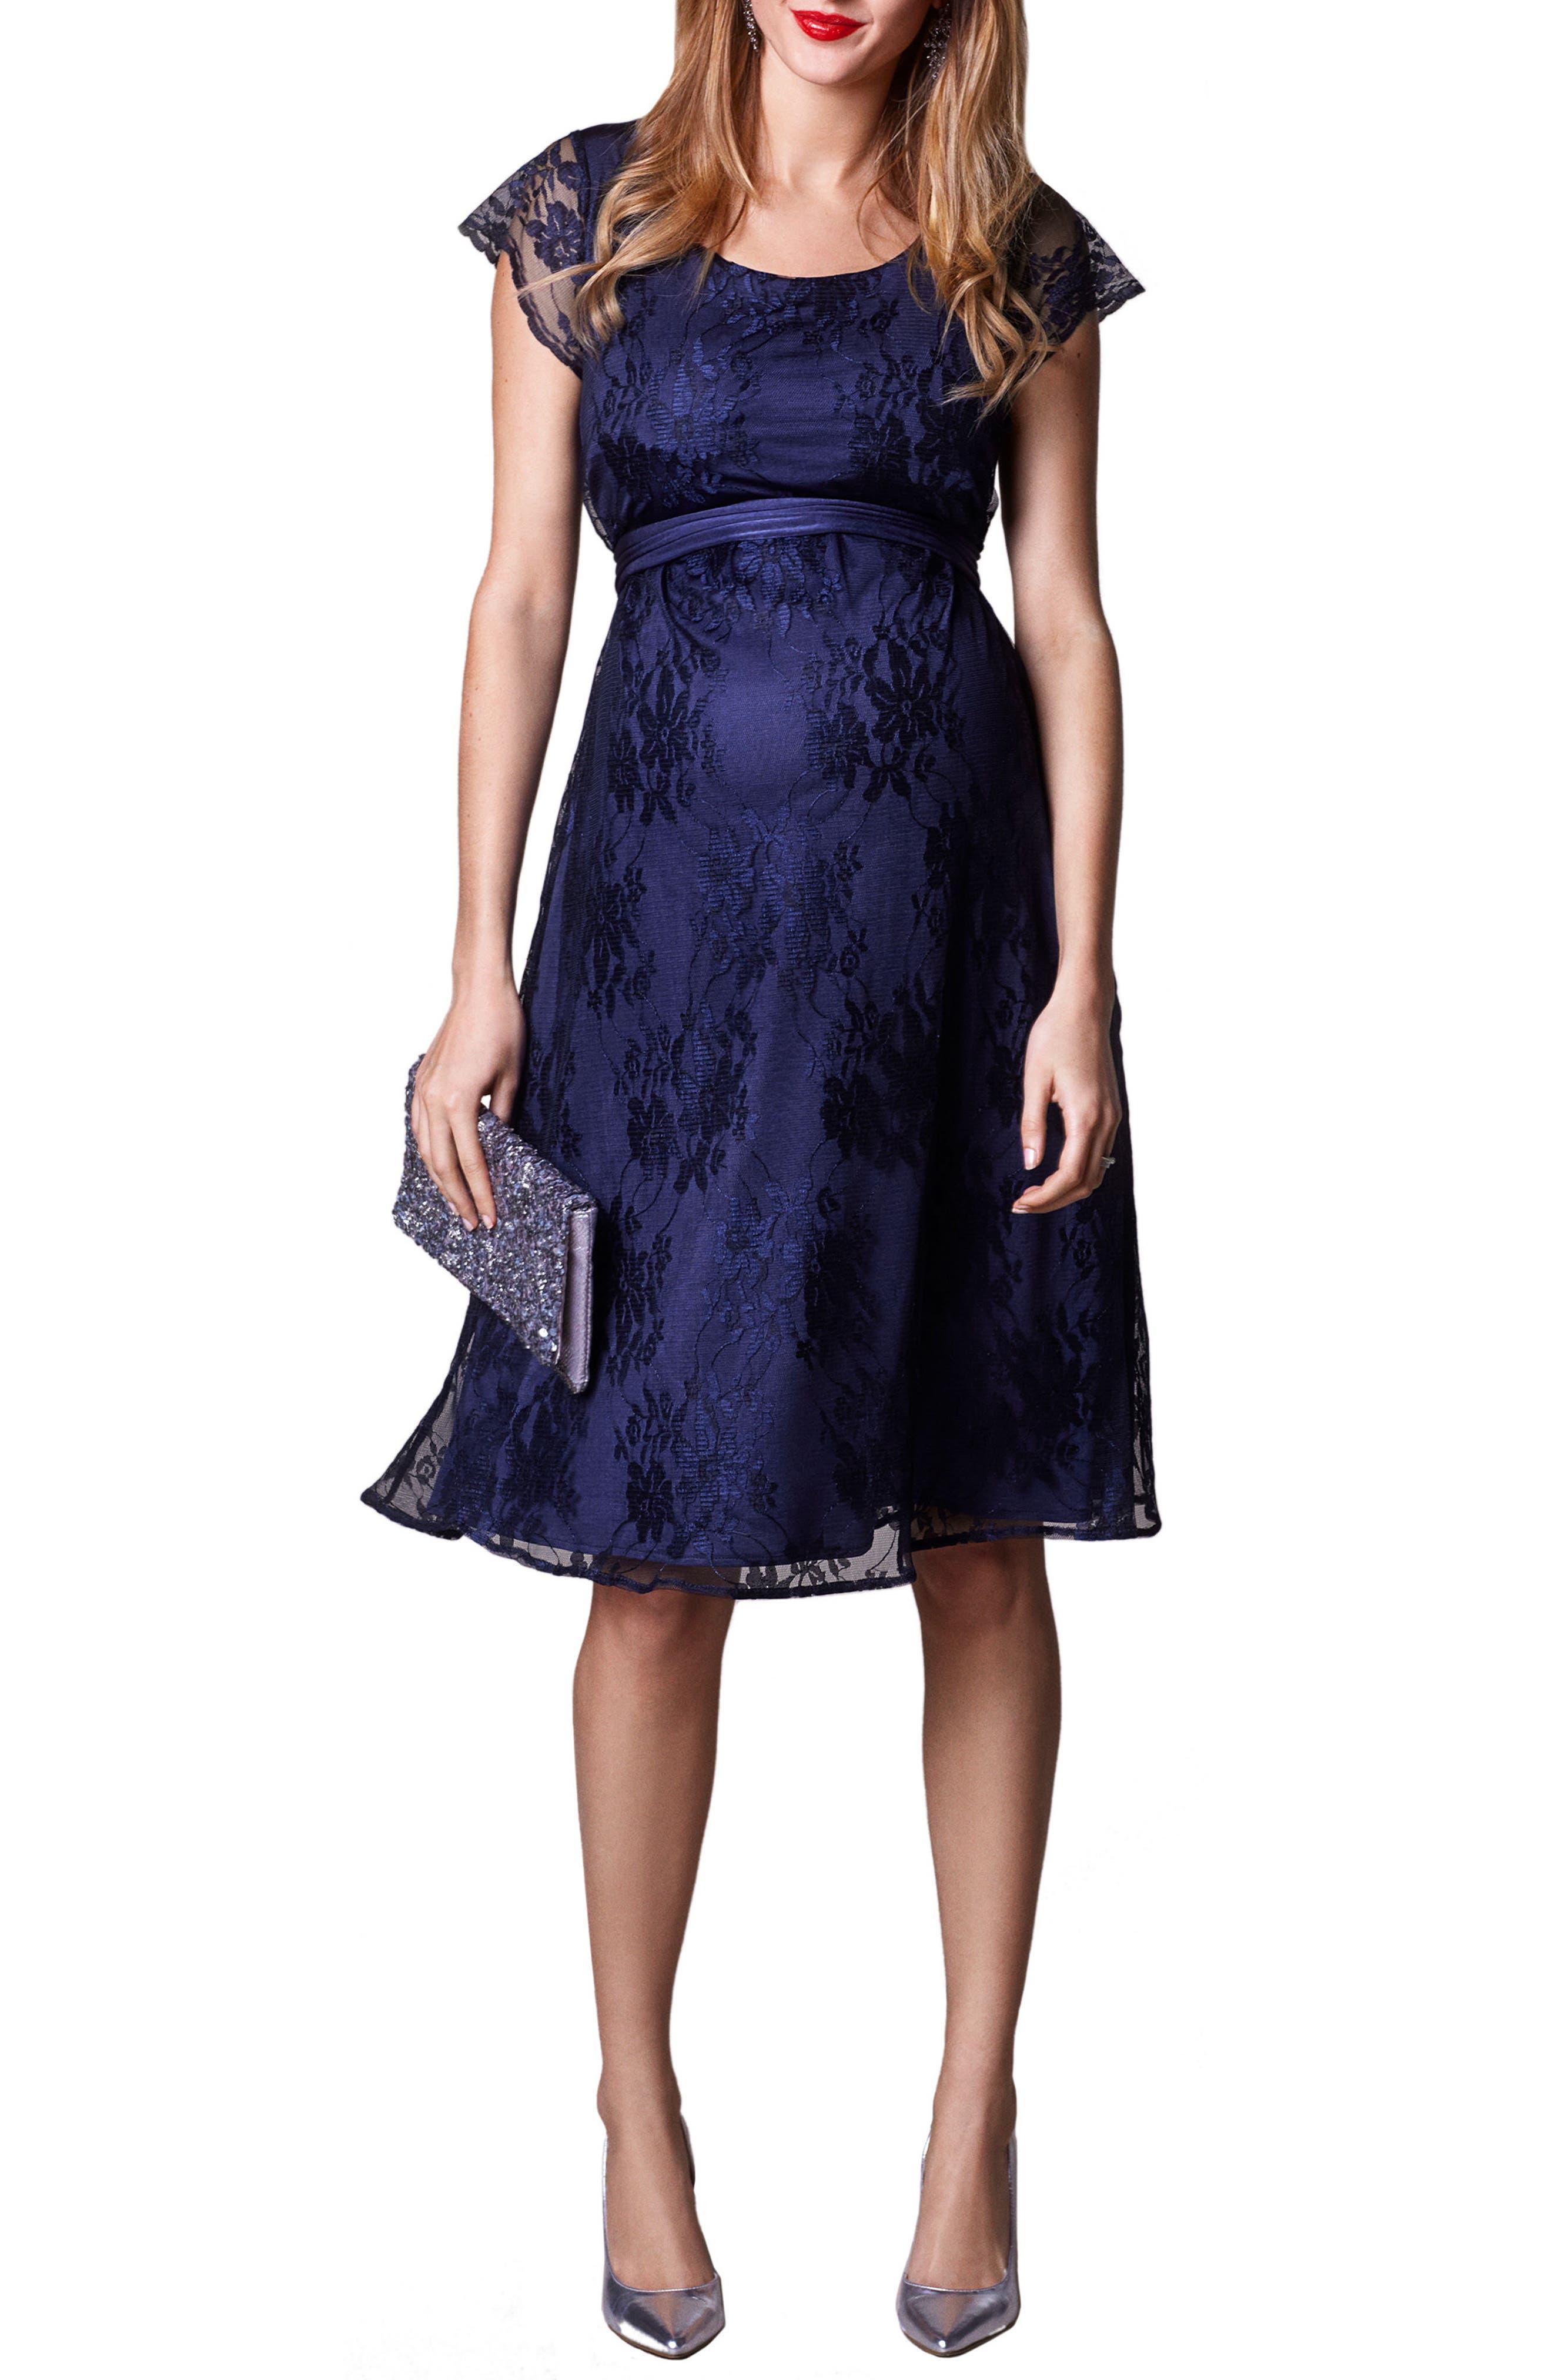 Tiffany Rose April Maternity/Nursing Dress